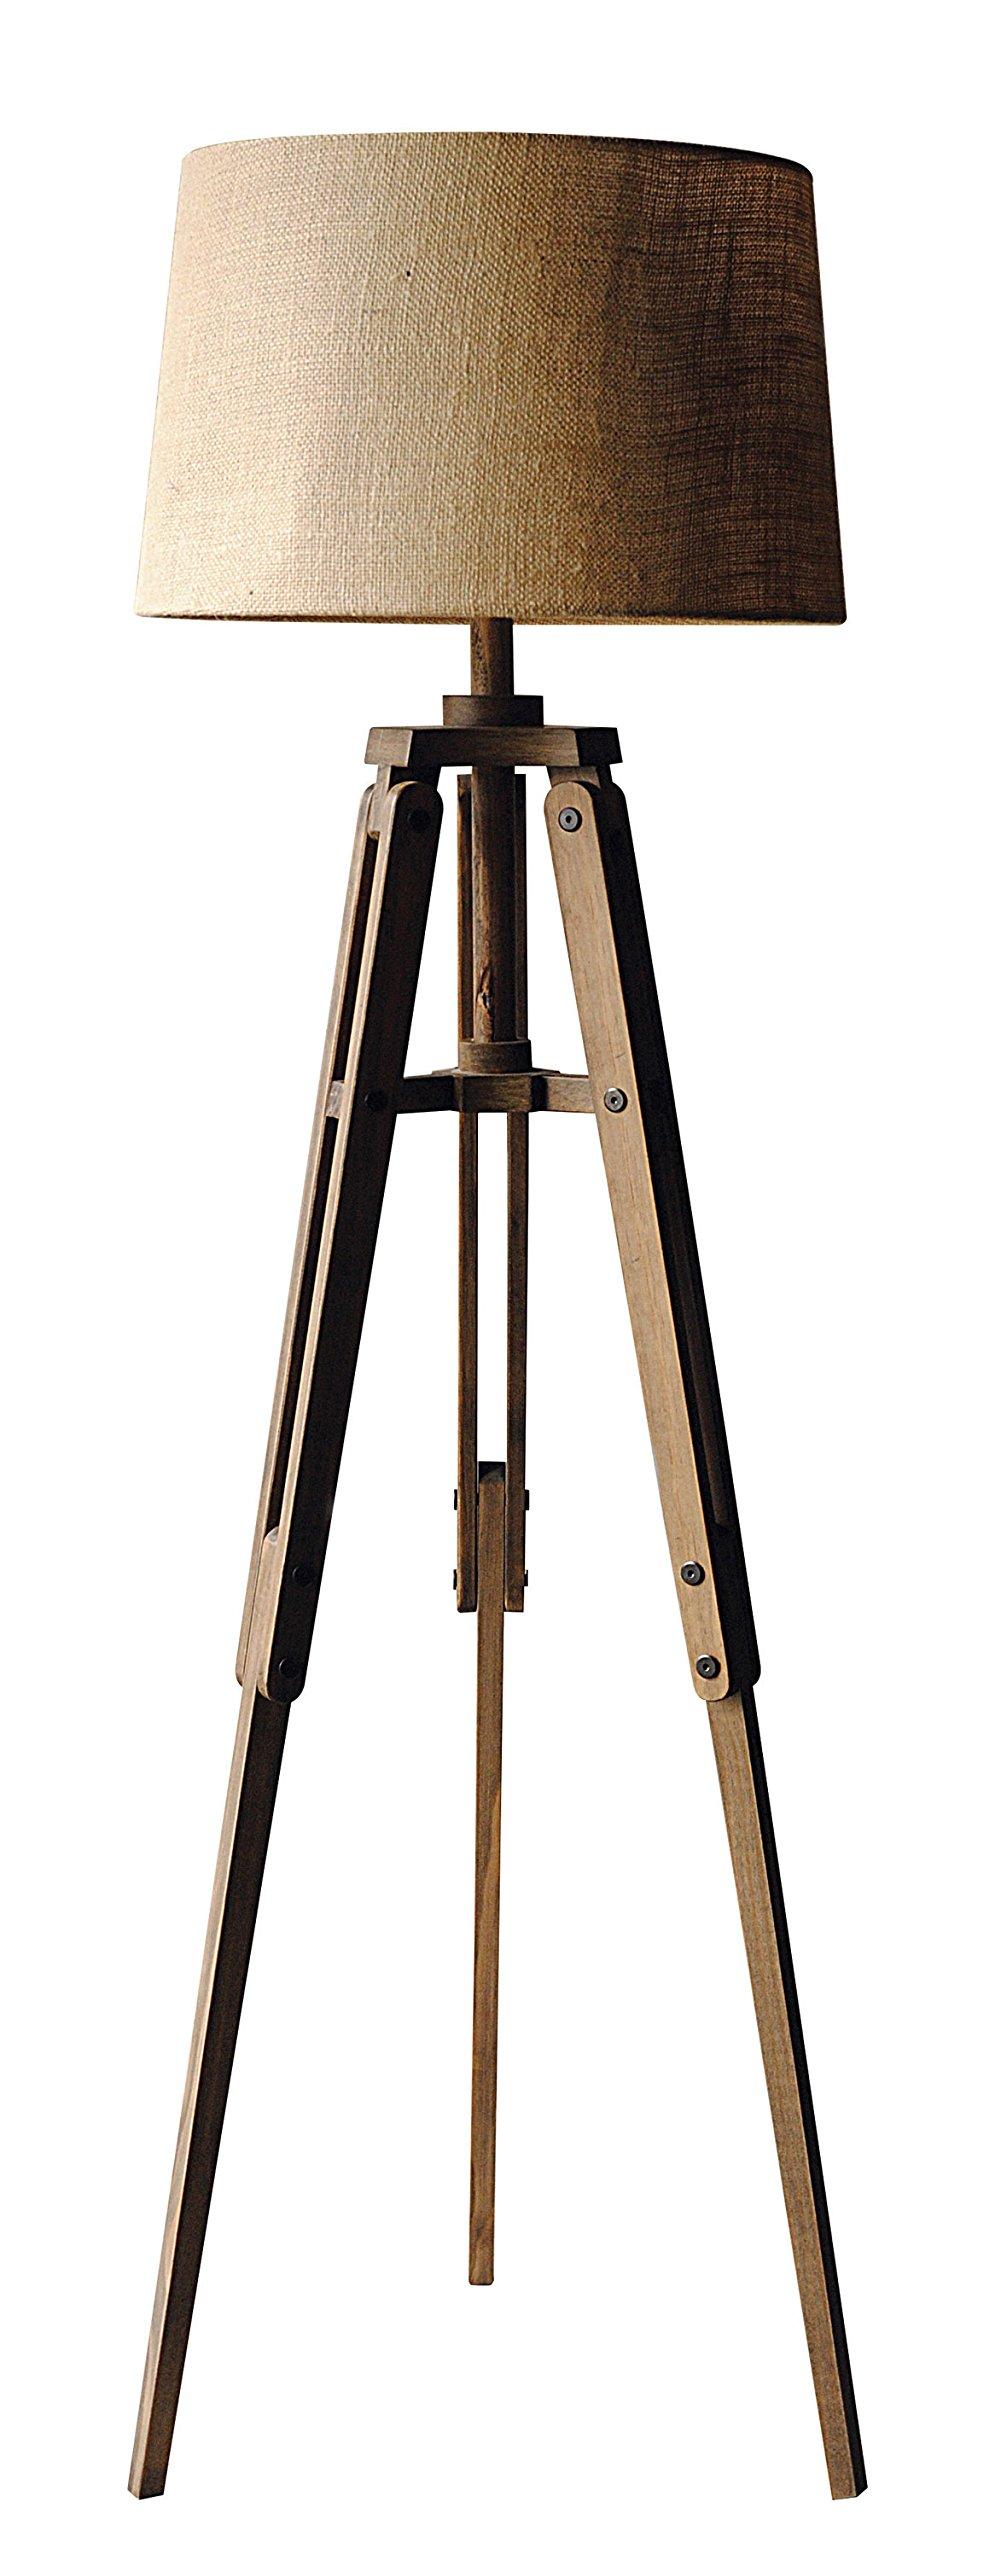 Creative Co-Op Mariner Wood Tripod Floor Lamp with Shade, 62.25'' Height